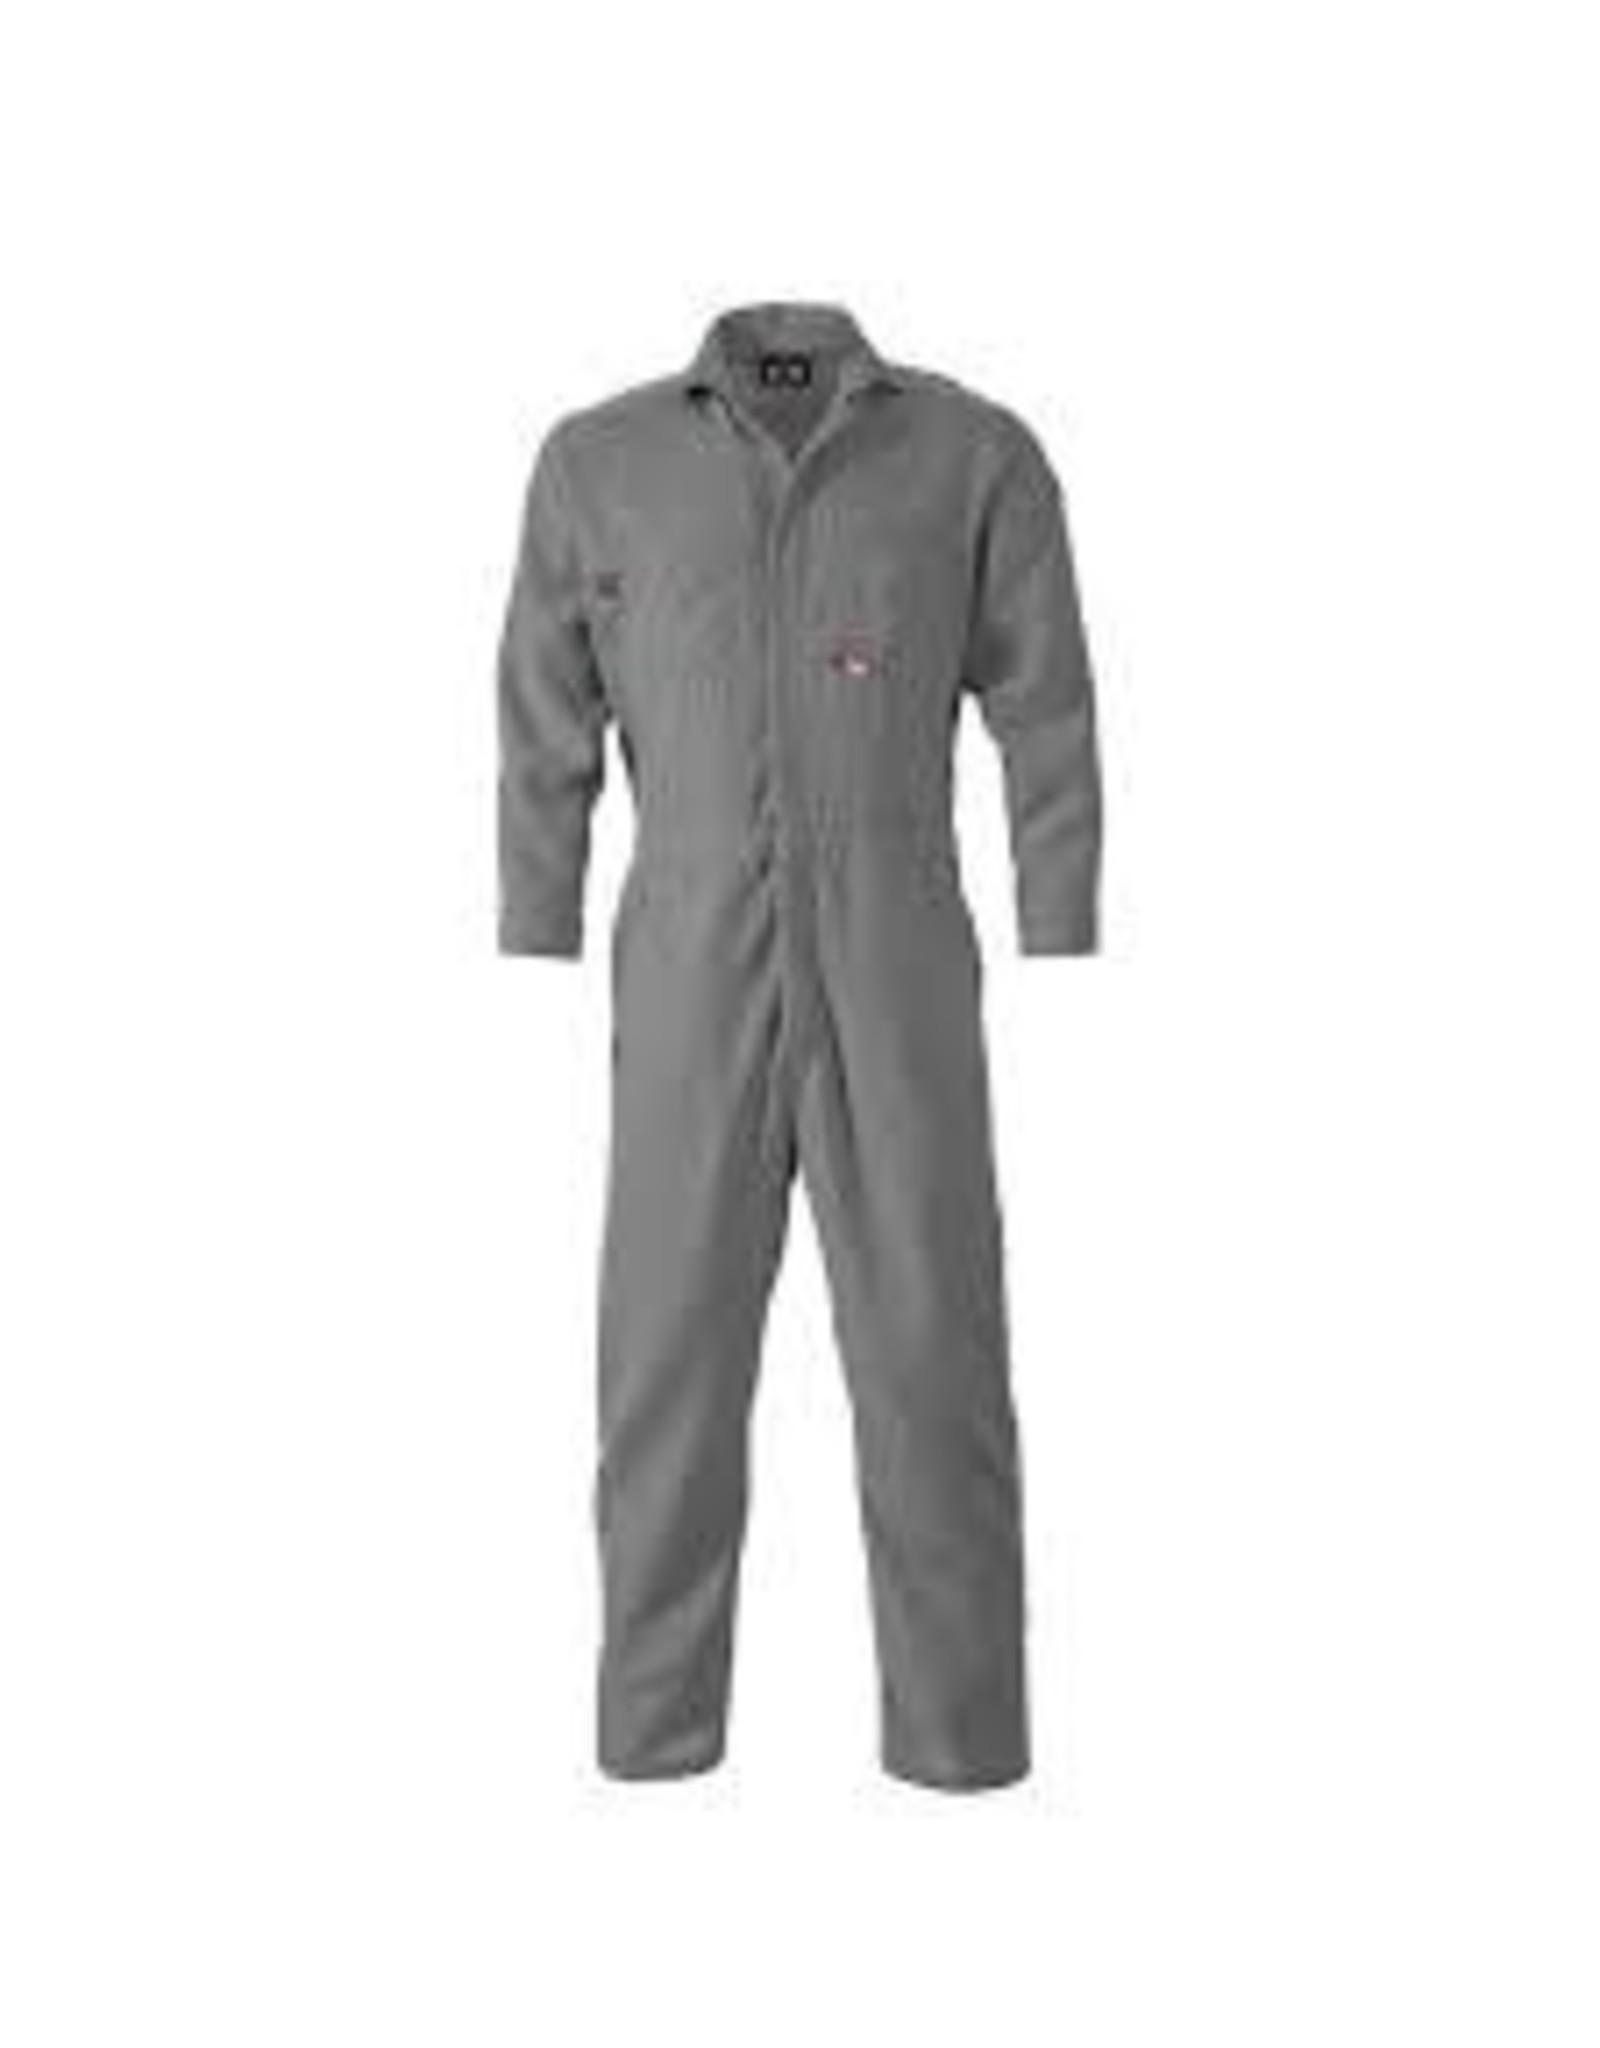 Saf-Tech Saf-Tech 7 oz 100% Cotton High-Vis Indura Contractor FR Coverall